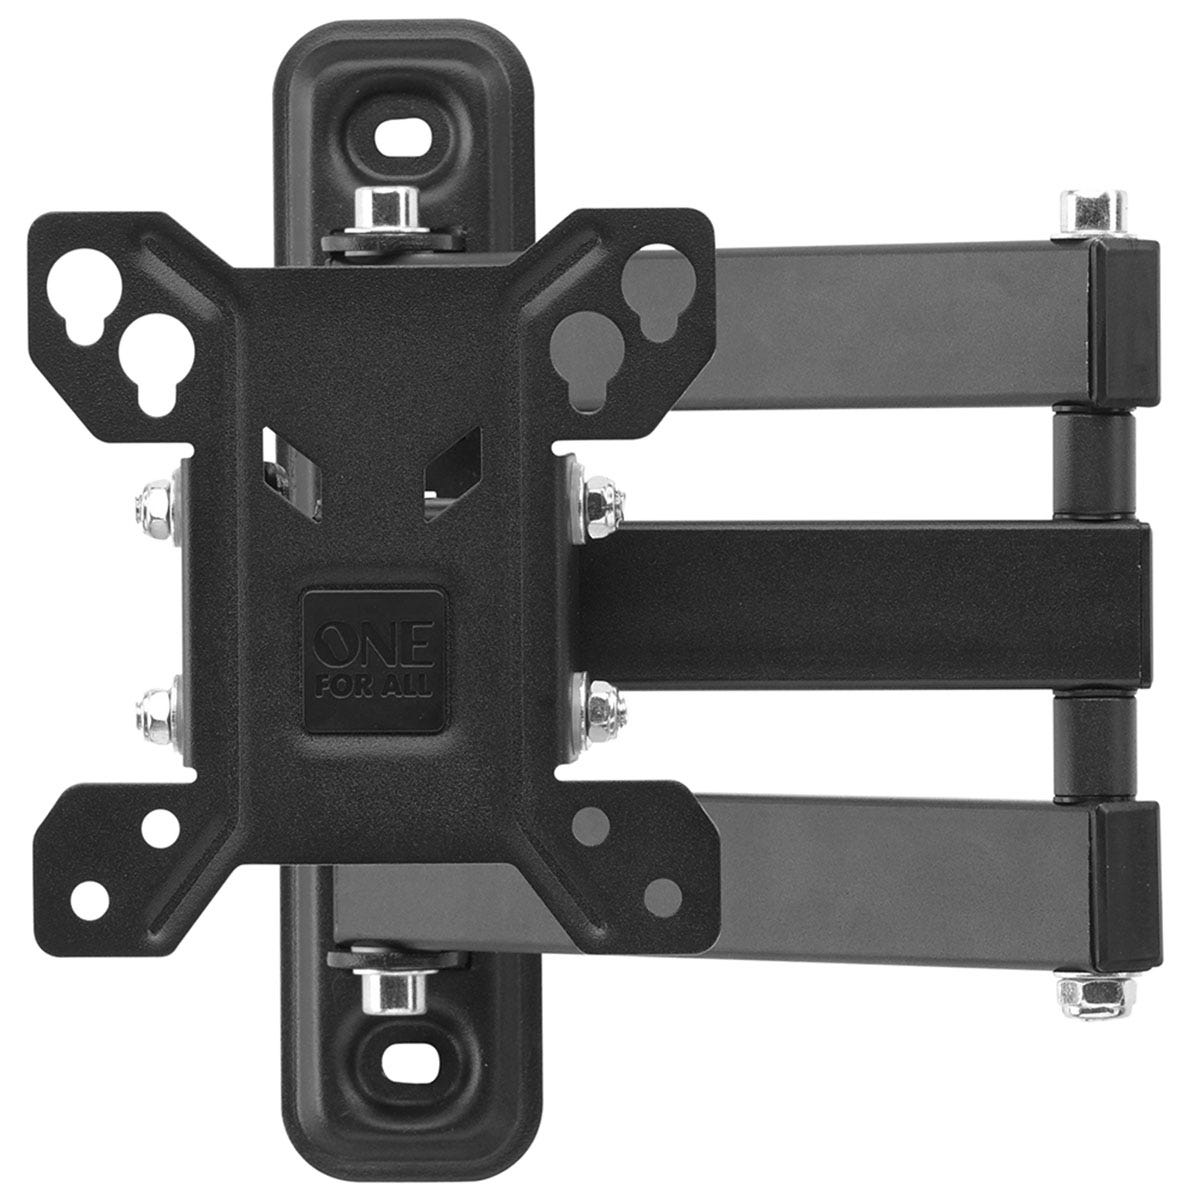 One For All 13-27 inch TV Bracket Turn 180 Smart Series - Black